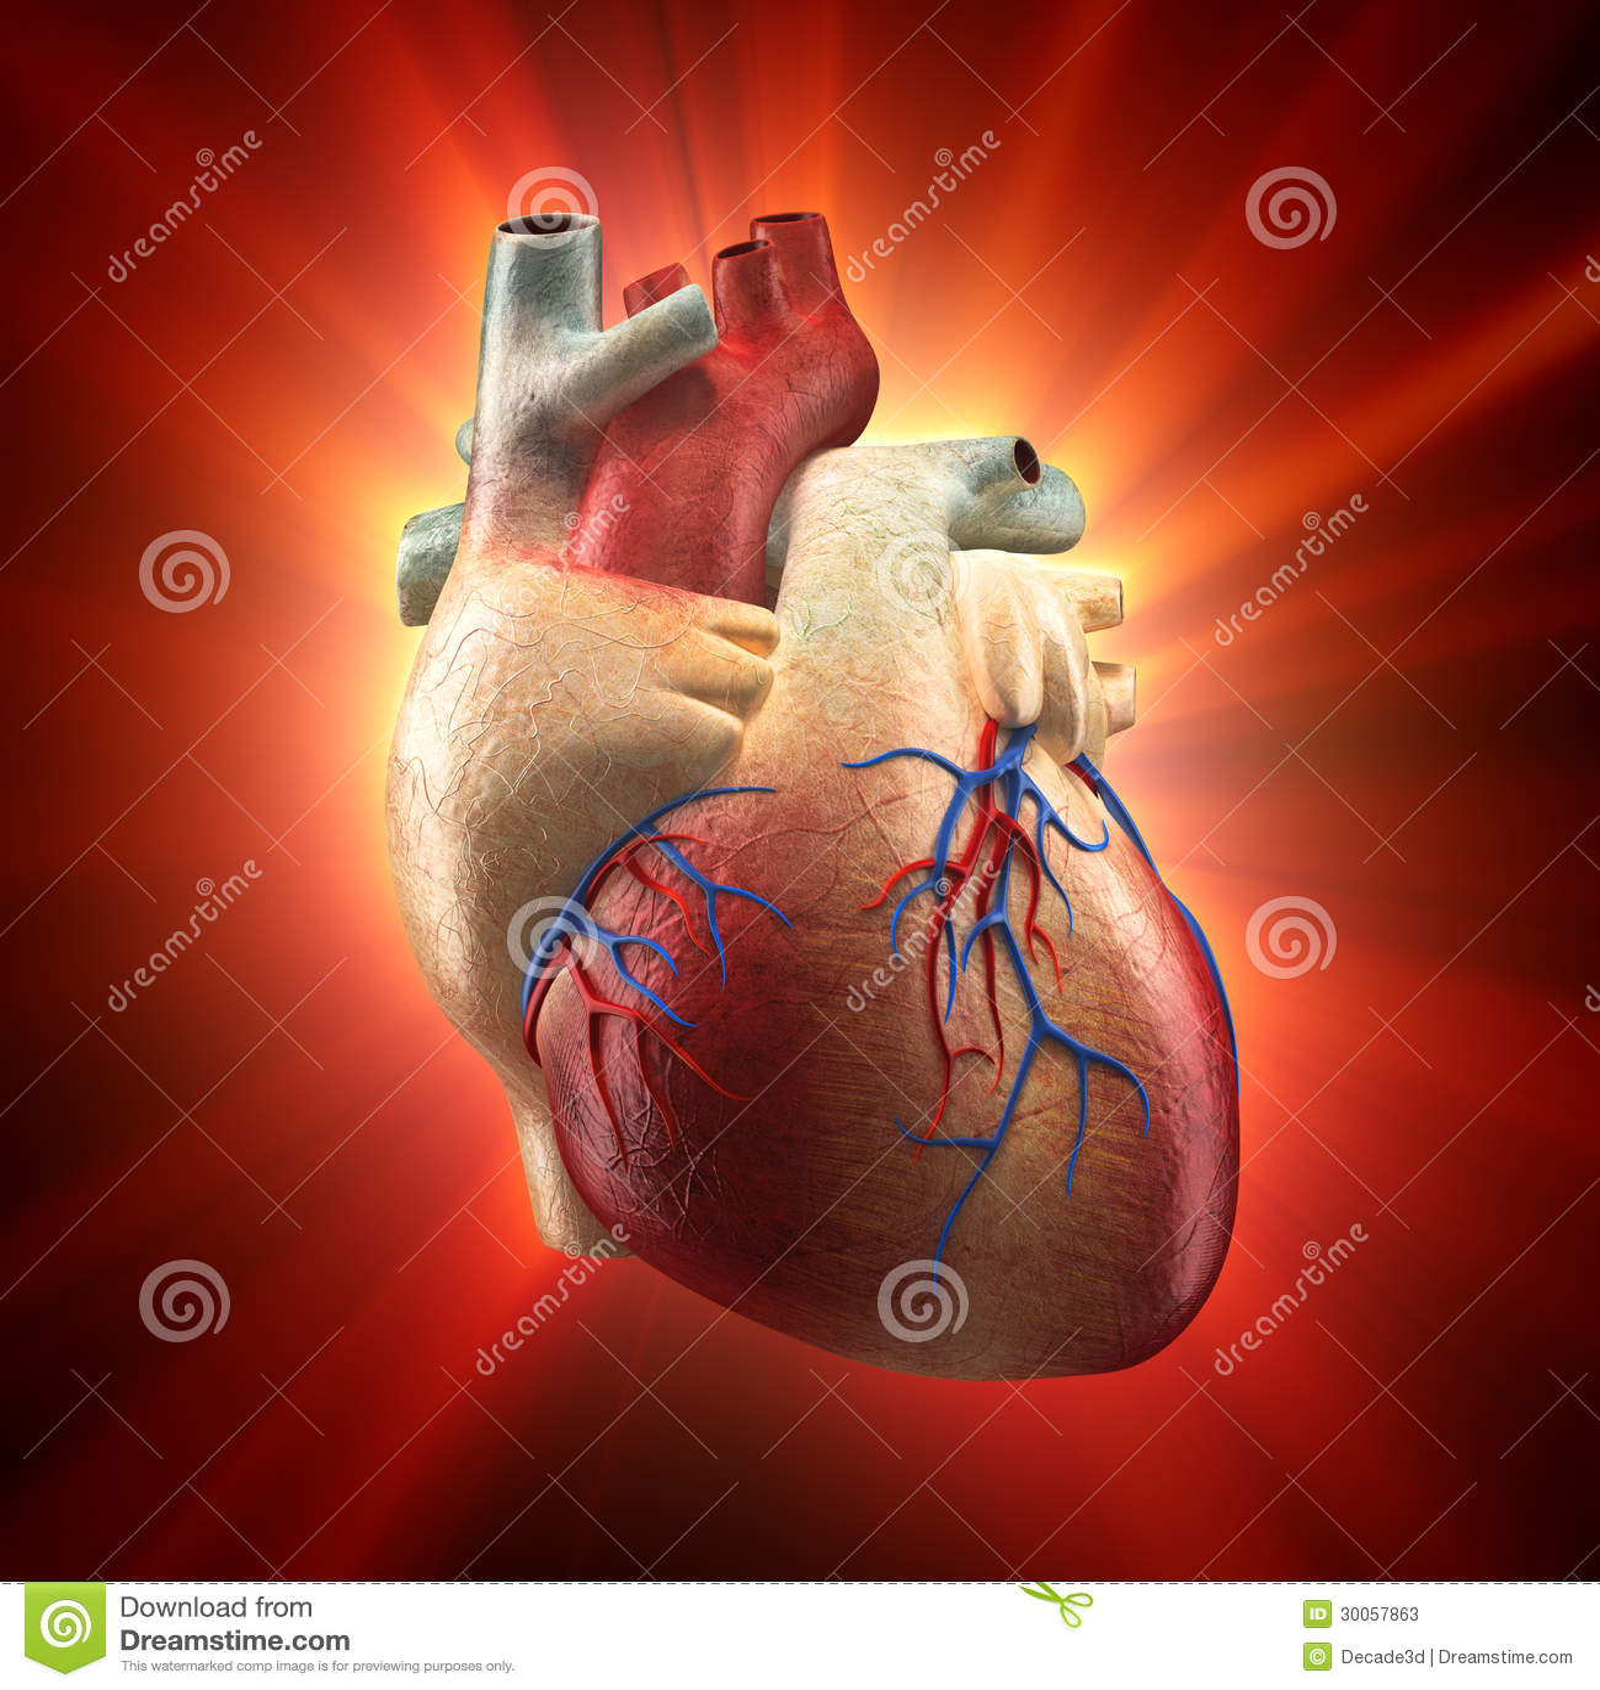 Real Heart Shinning In Light Human Anatomy Model Stock